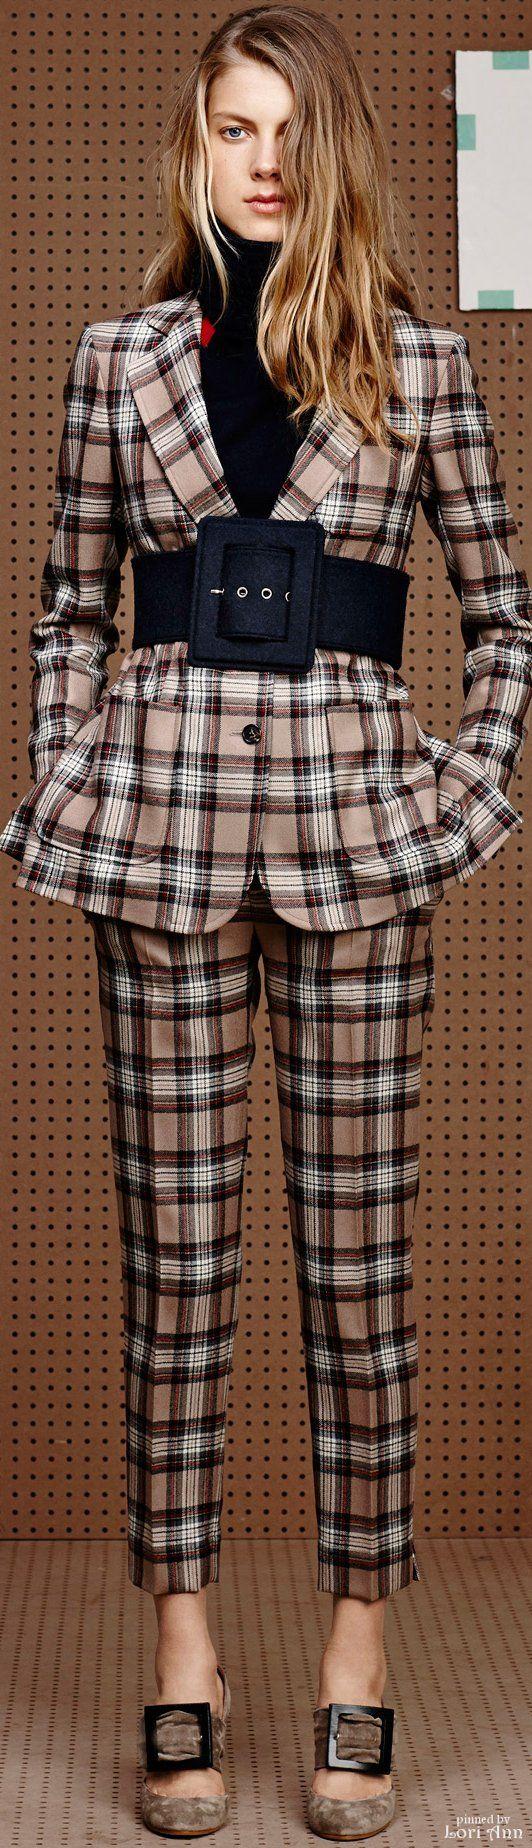 ℳiss Tallulah Tatum wears her nova check, plaids and classic tartan  Poppy Pea  Band of Outsiders